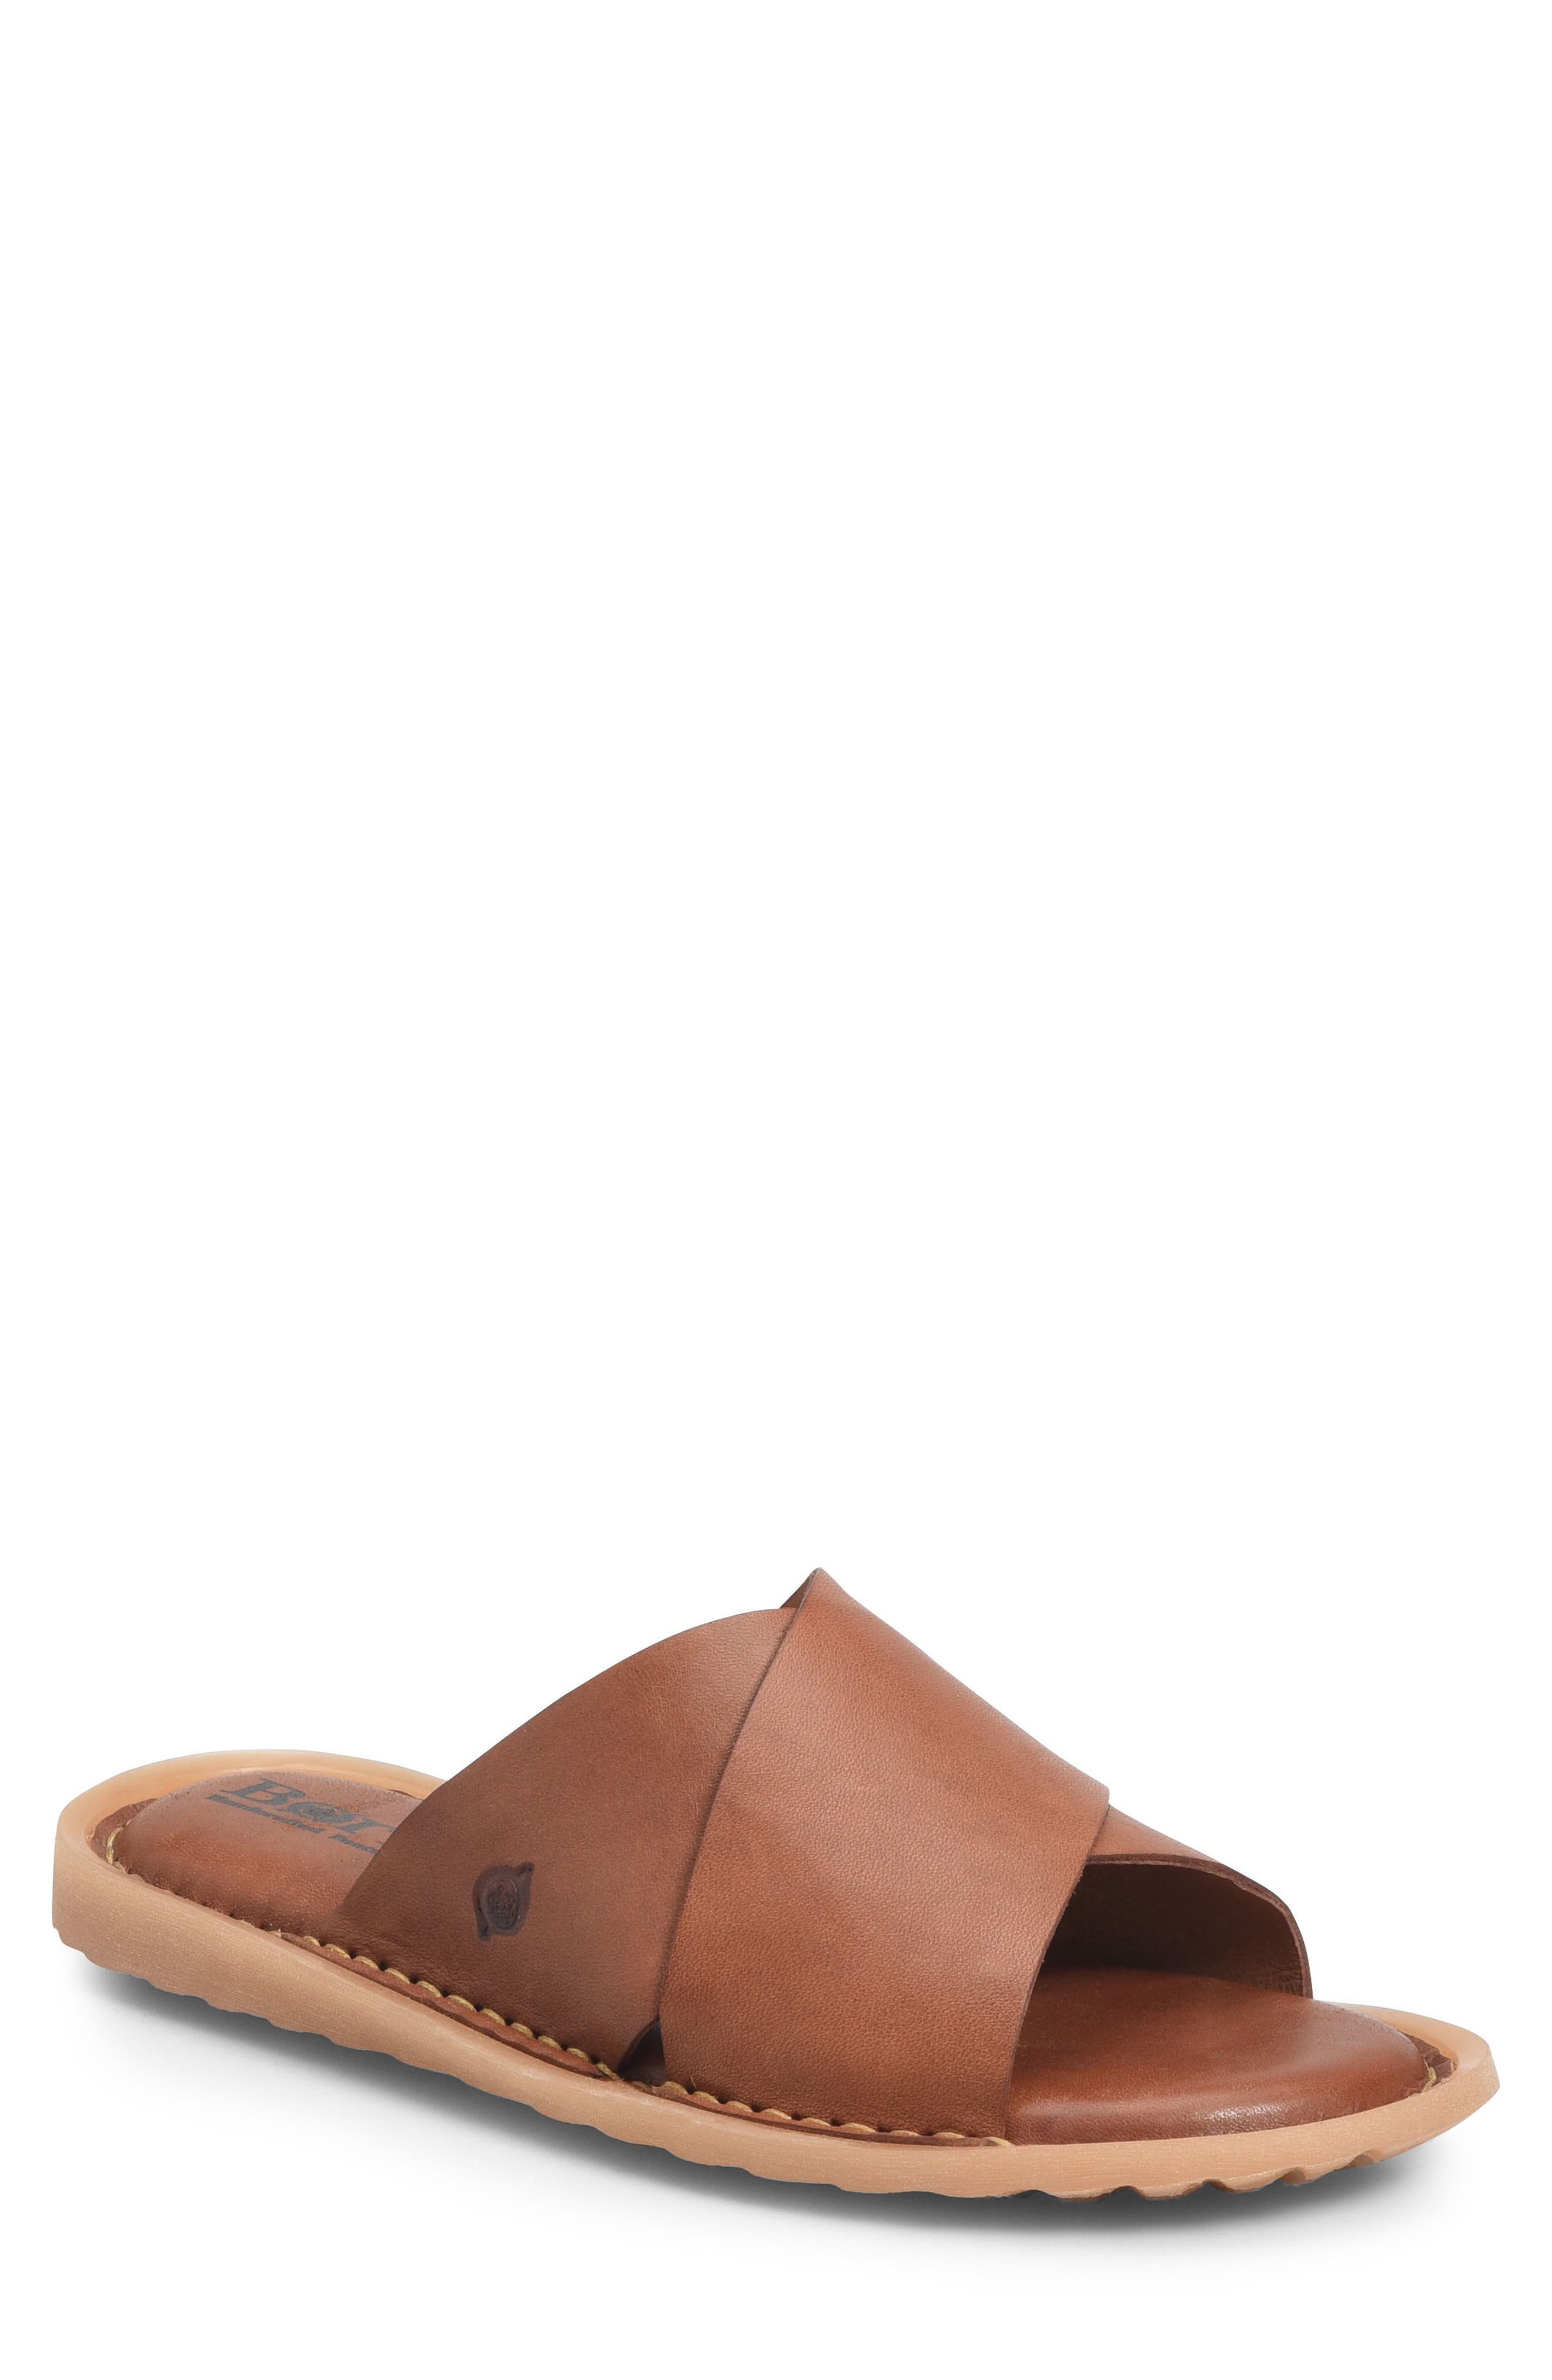 Getaway Slide Sandal,                             Main thumbnail 1, color,                             Rust Leather